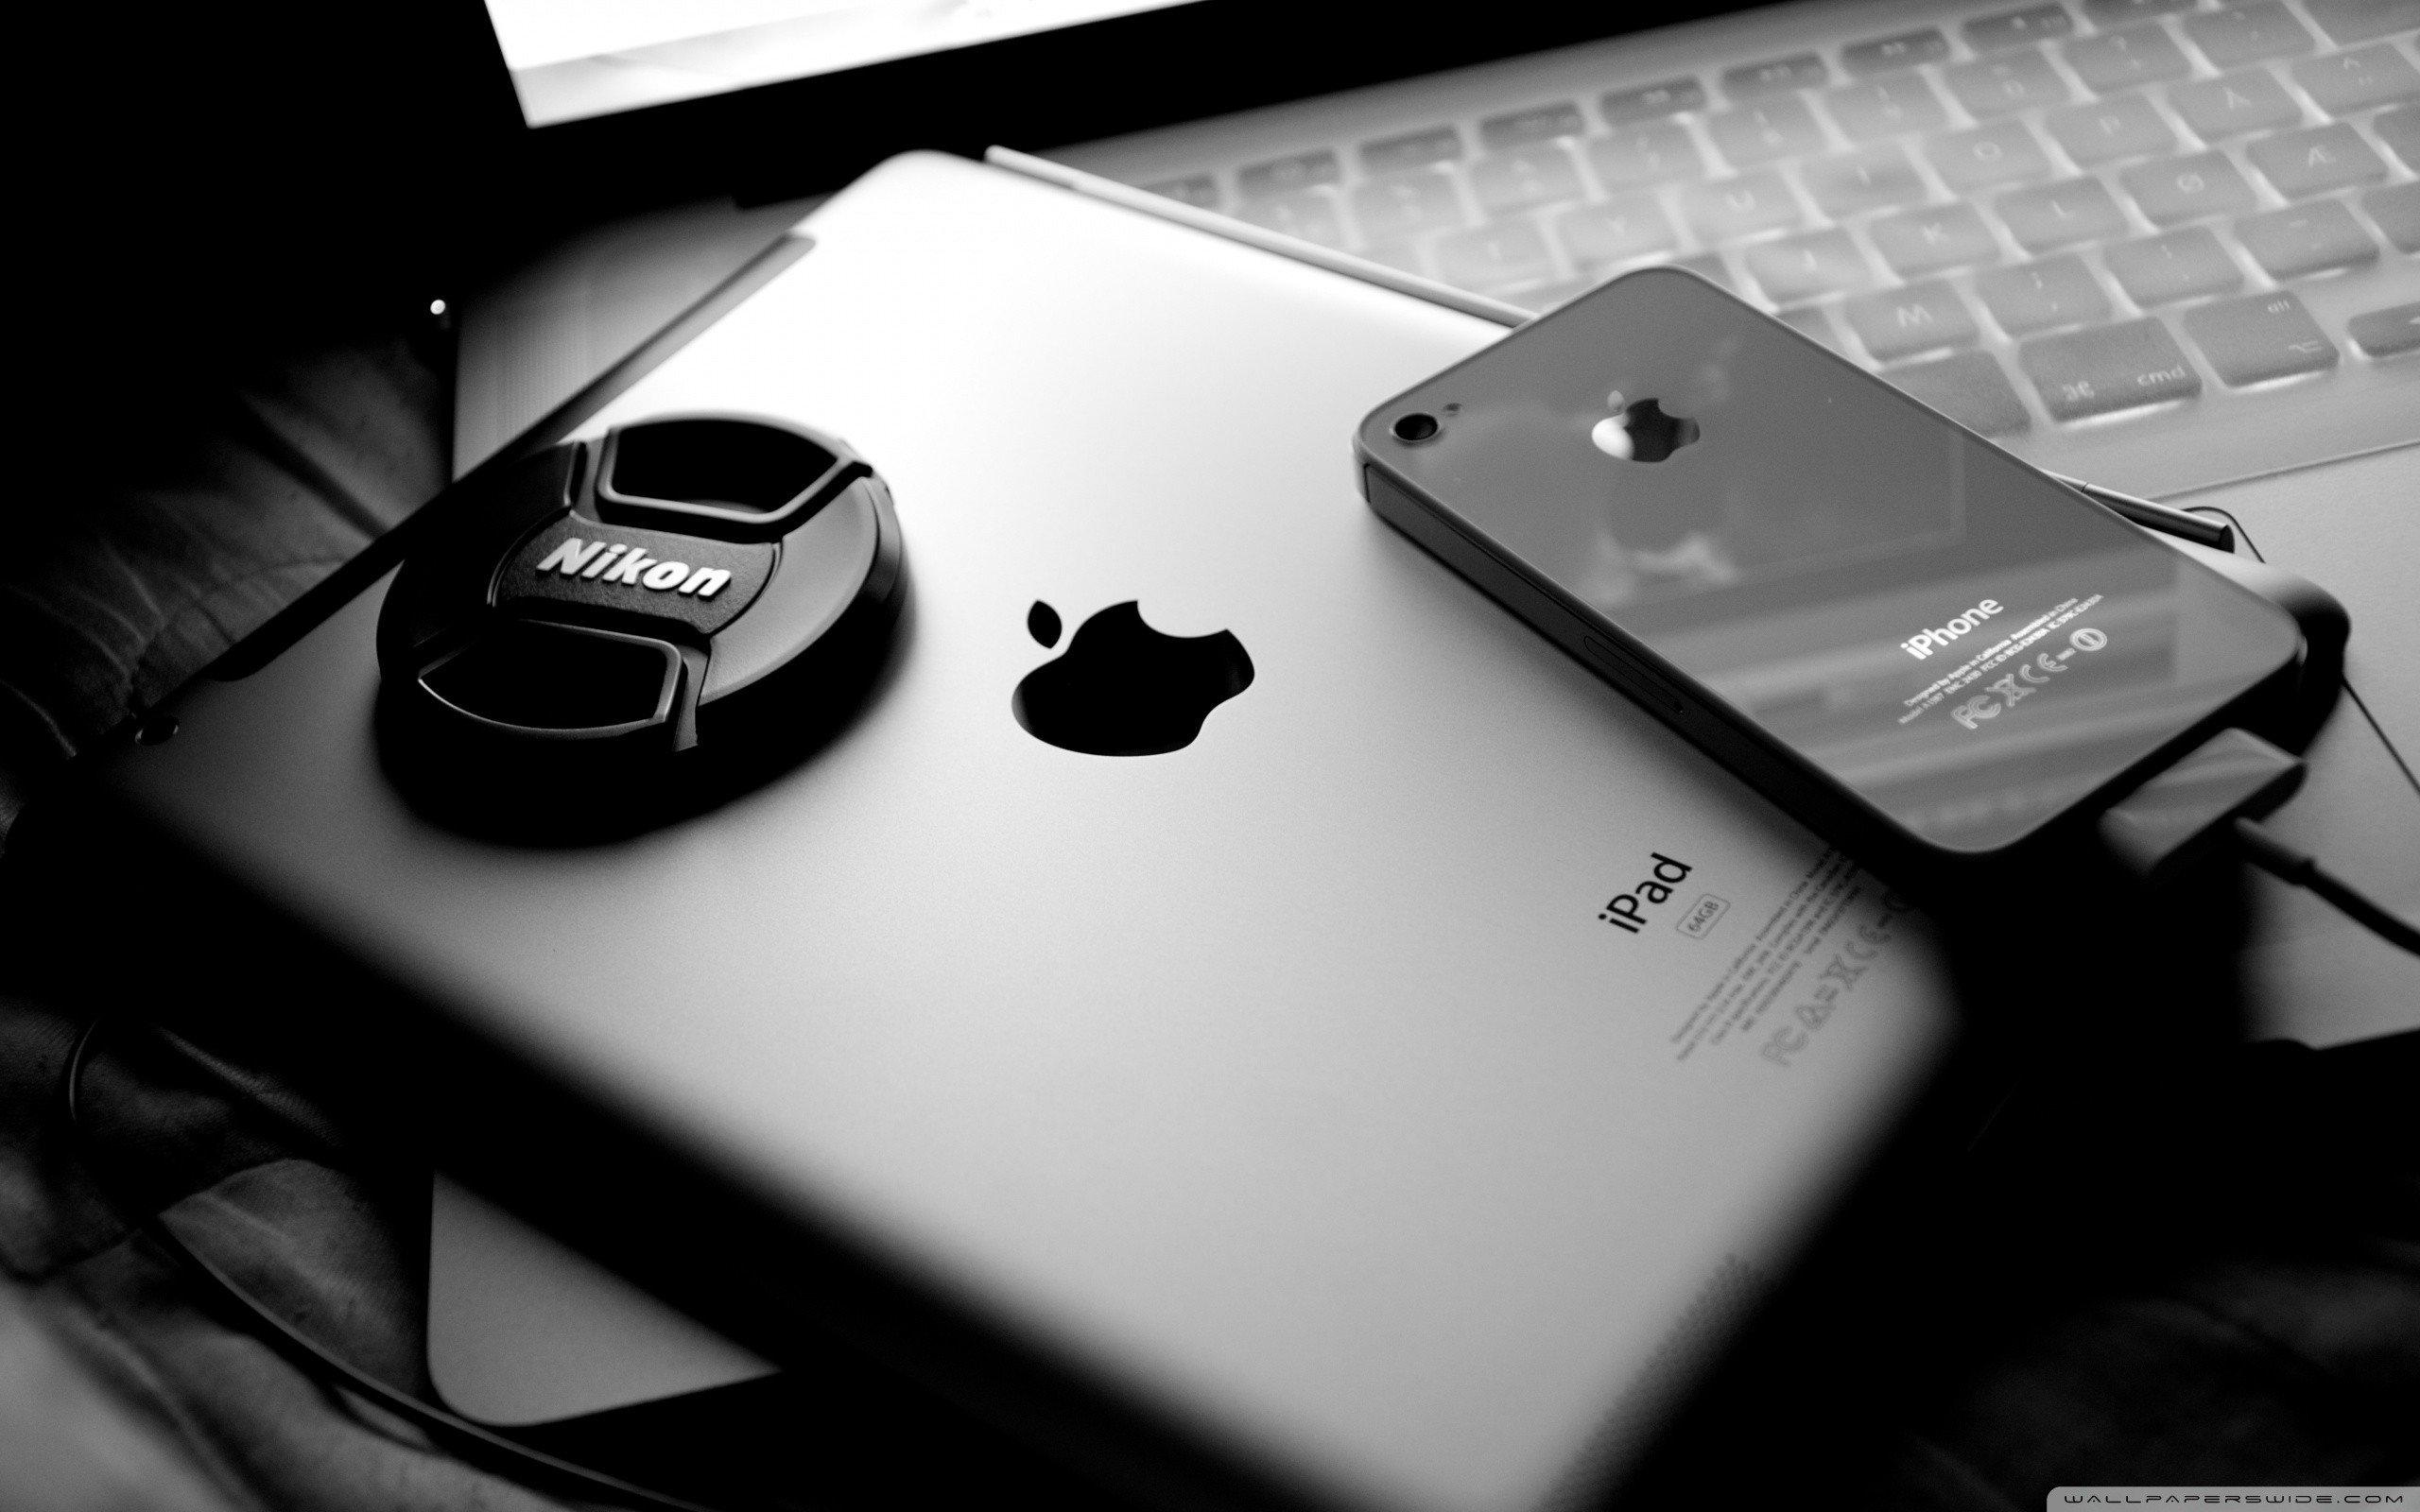 Apple inc iphone nikon ipad technology macbook hd for Immagini hd apple